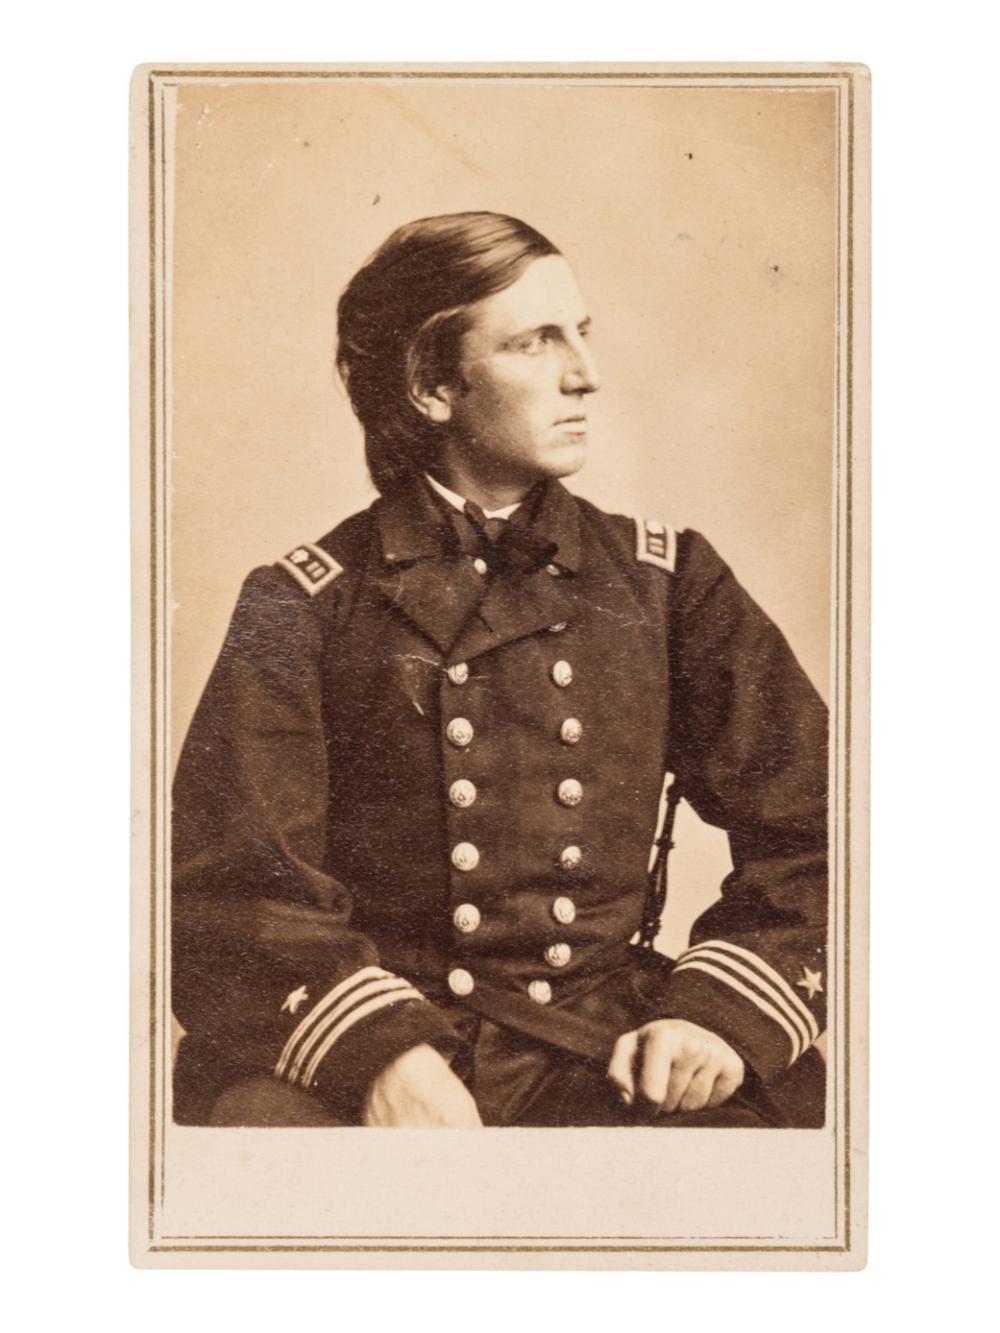 CUSHING, William Barker (1842-1874). CDV. New York: E. & H.T. Anthony, [ca.1862].